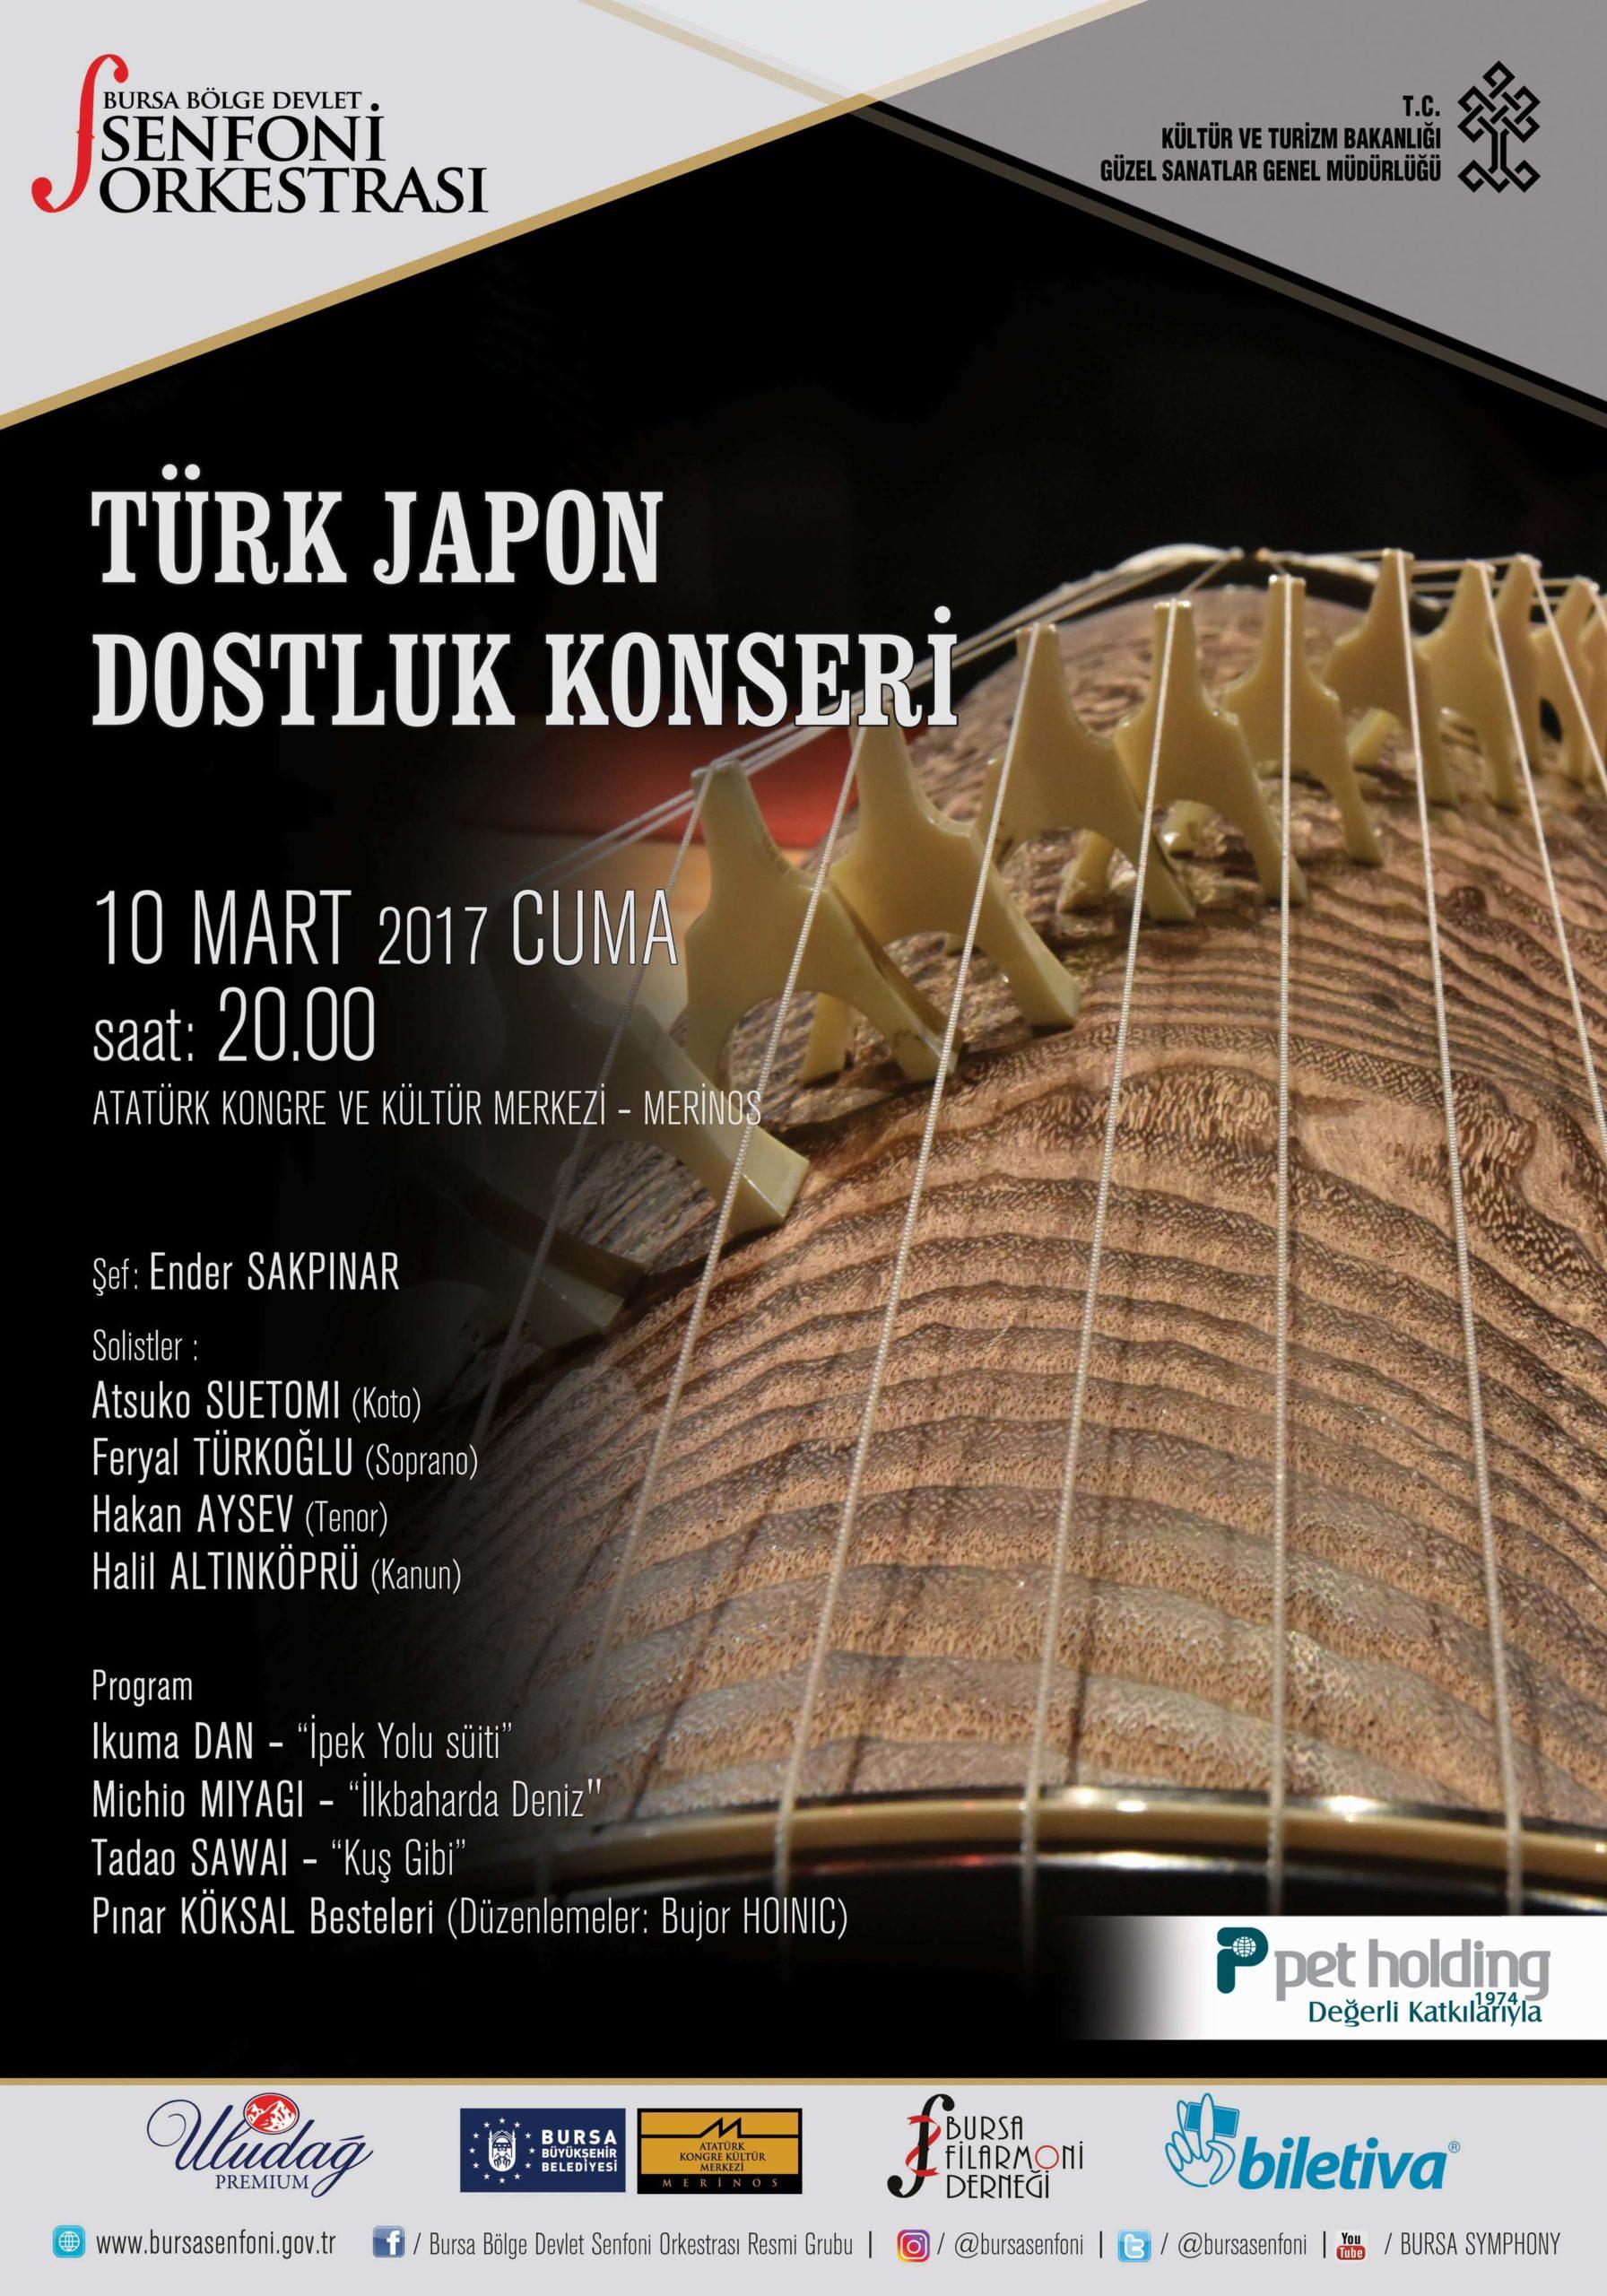 Bursa Konseri